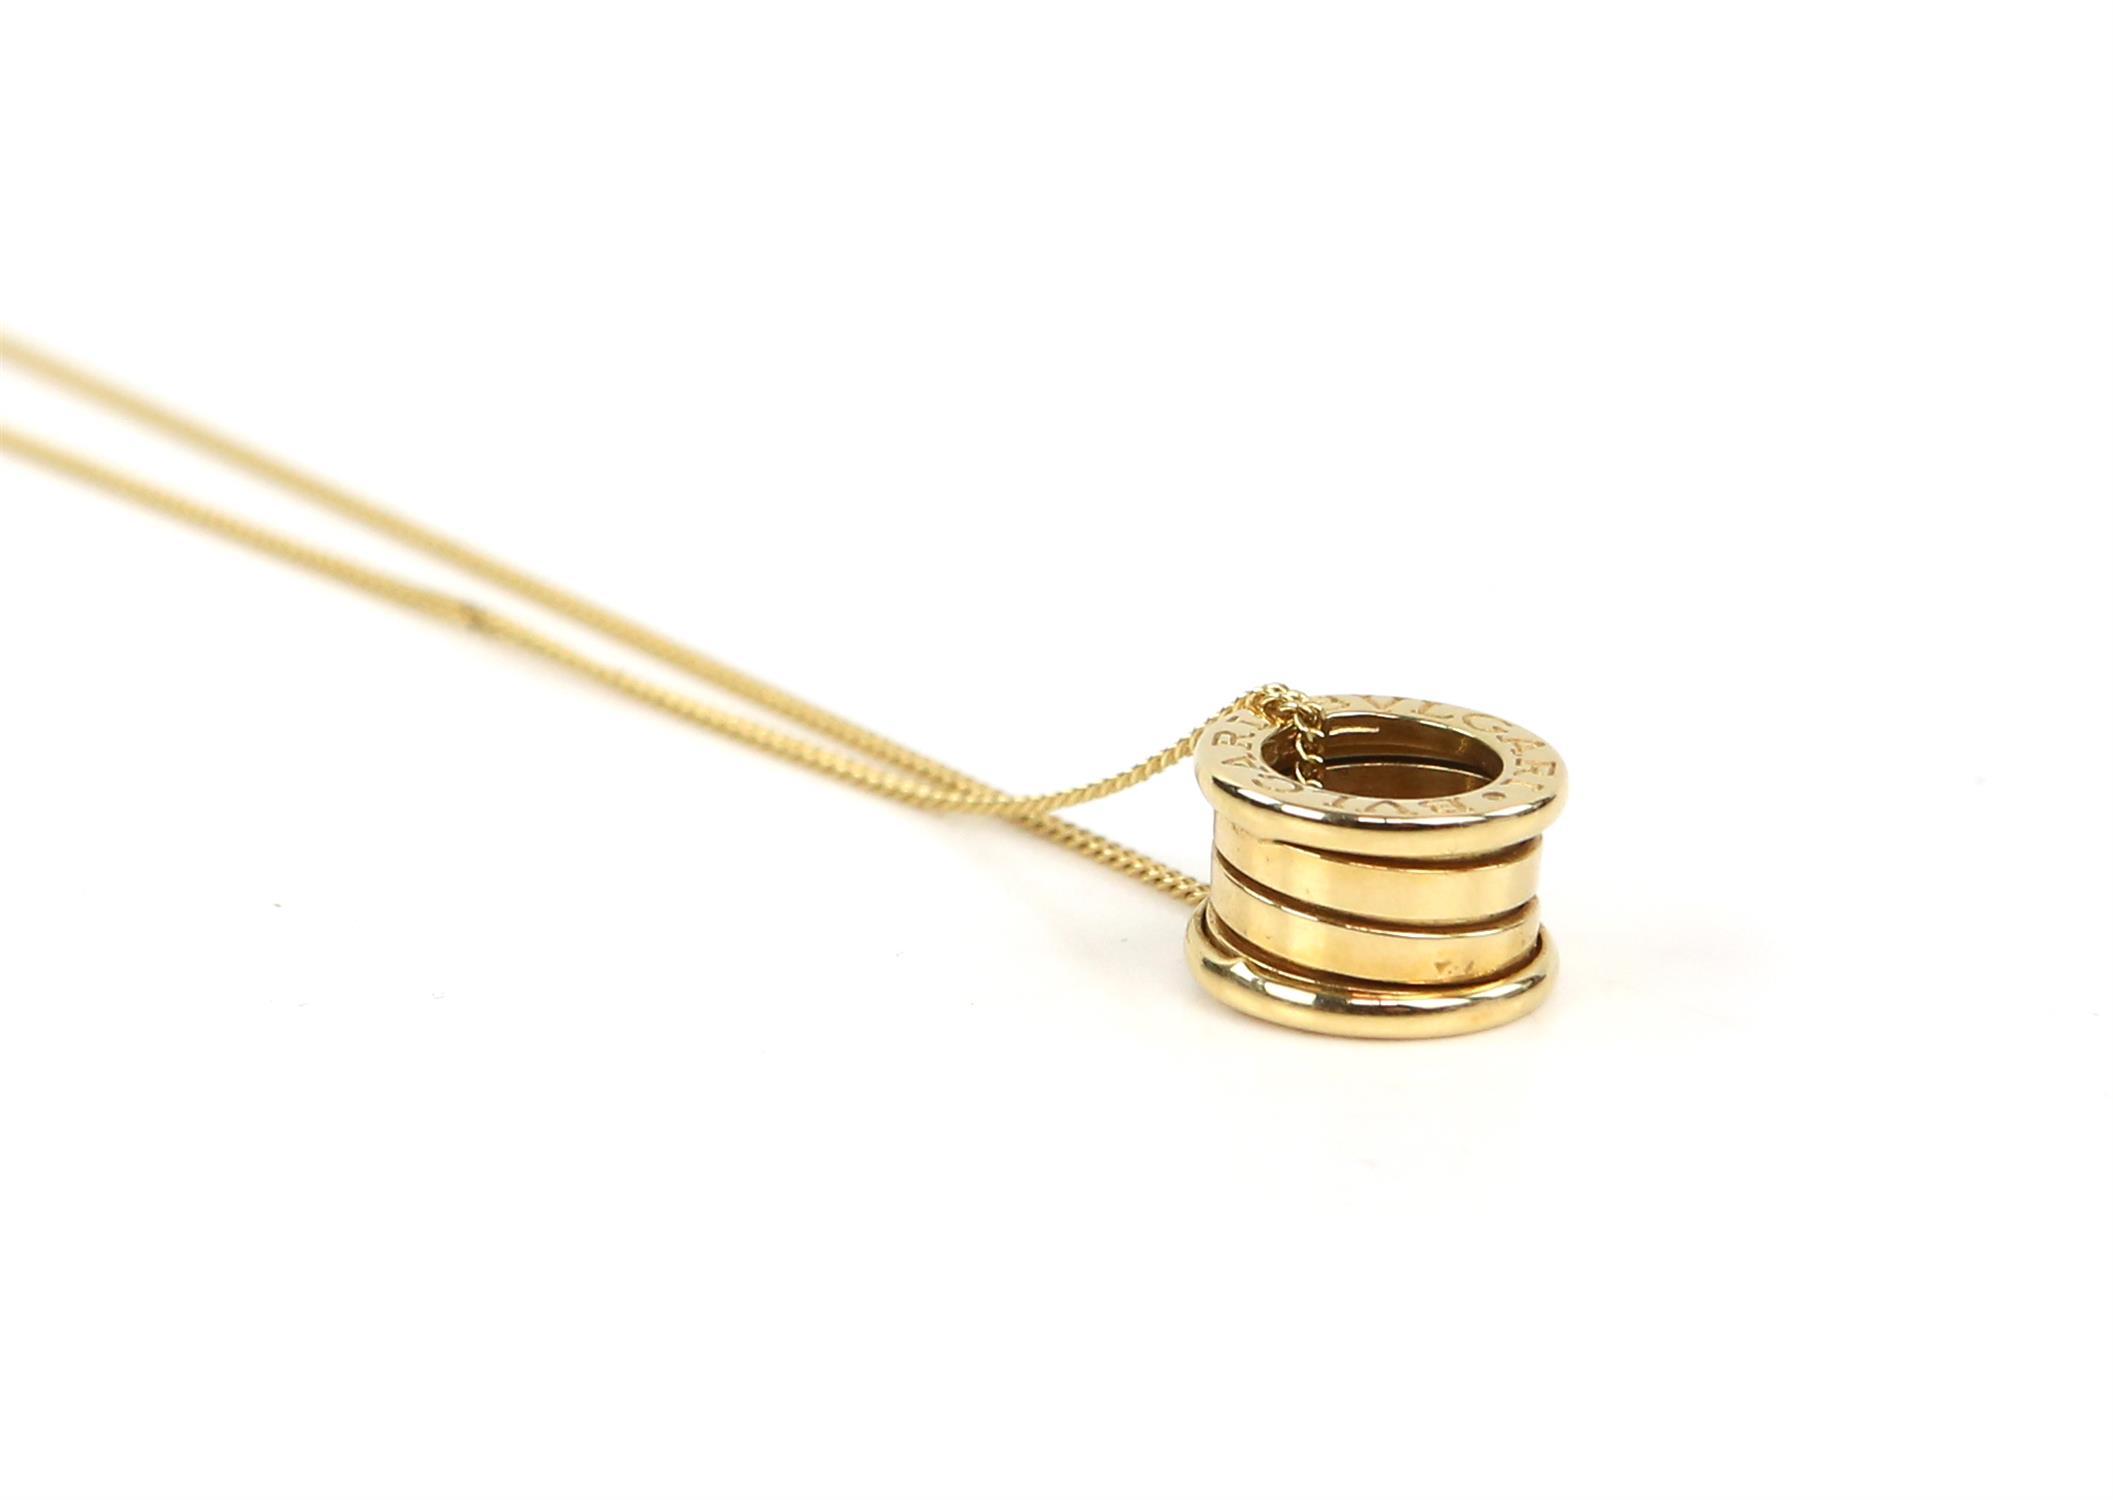 Bvlgari B.Zero1 small round pendant, in 18 ct yellow gold, marked Made in Italy 750 with Bvlgari - Image 3 of 5